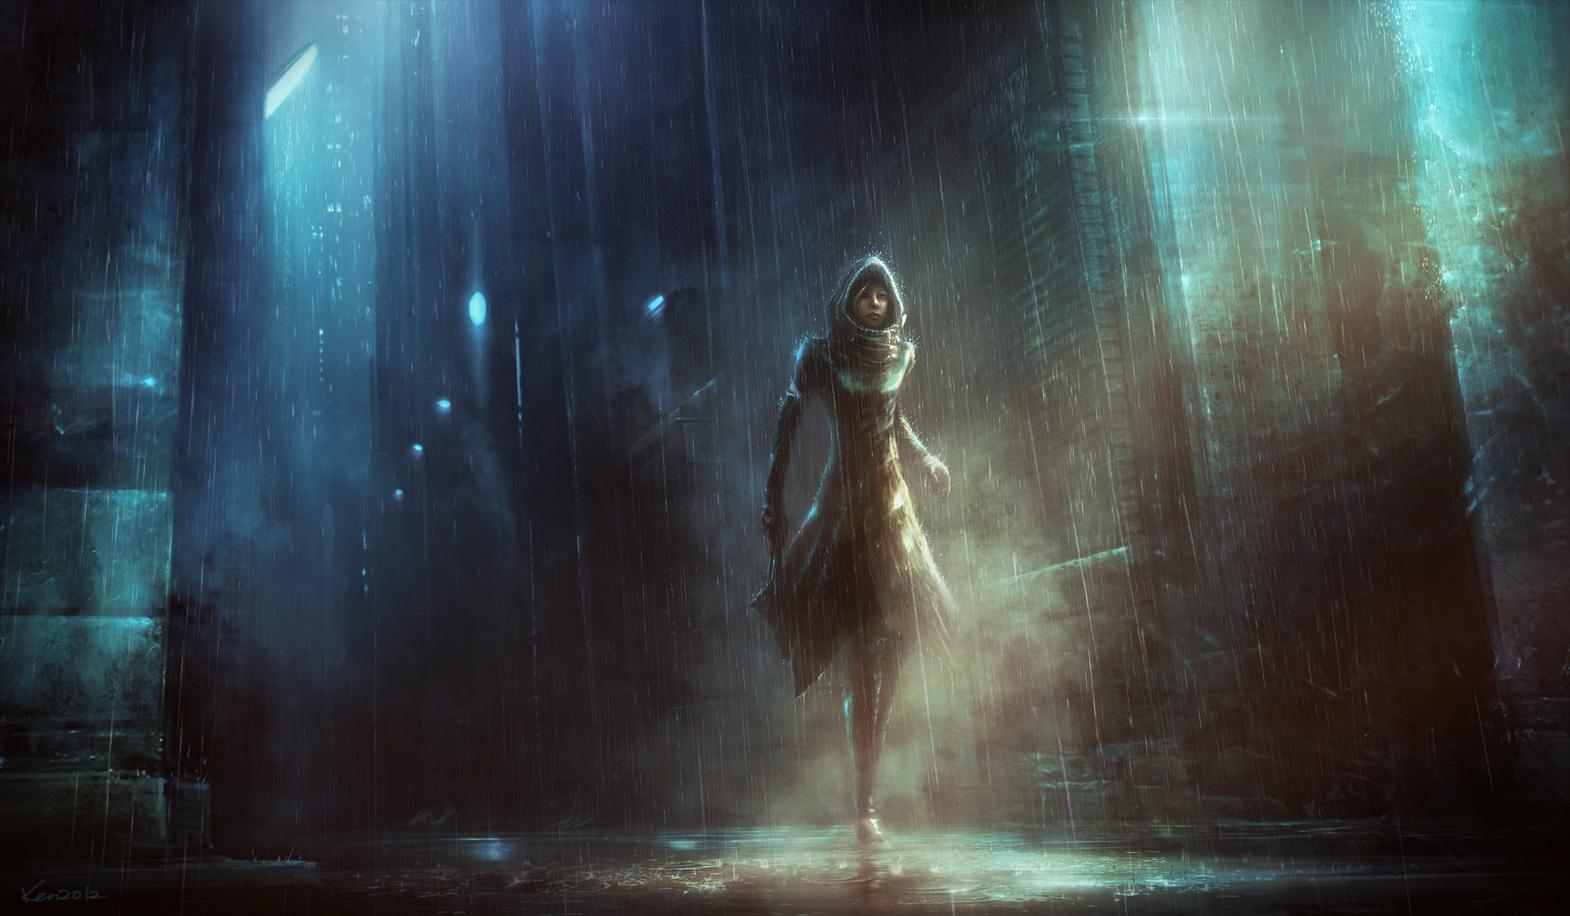 Rain by korbox (http://korbox.deviantart.com)